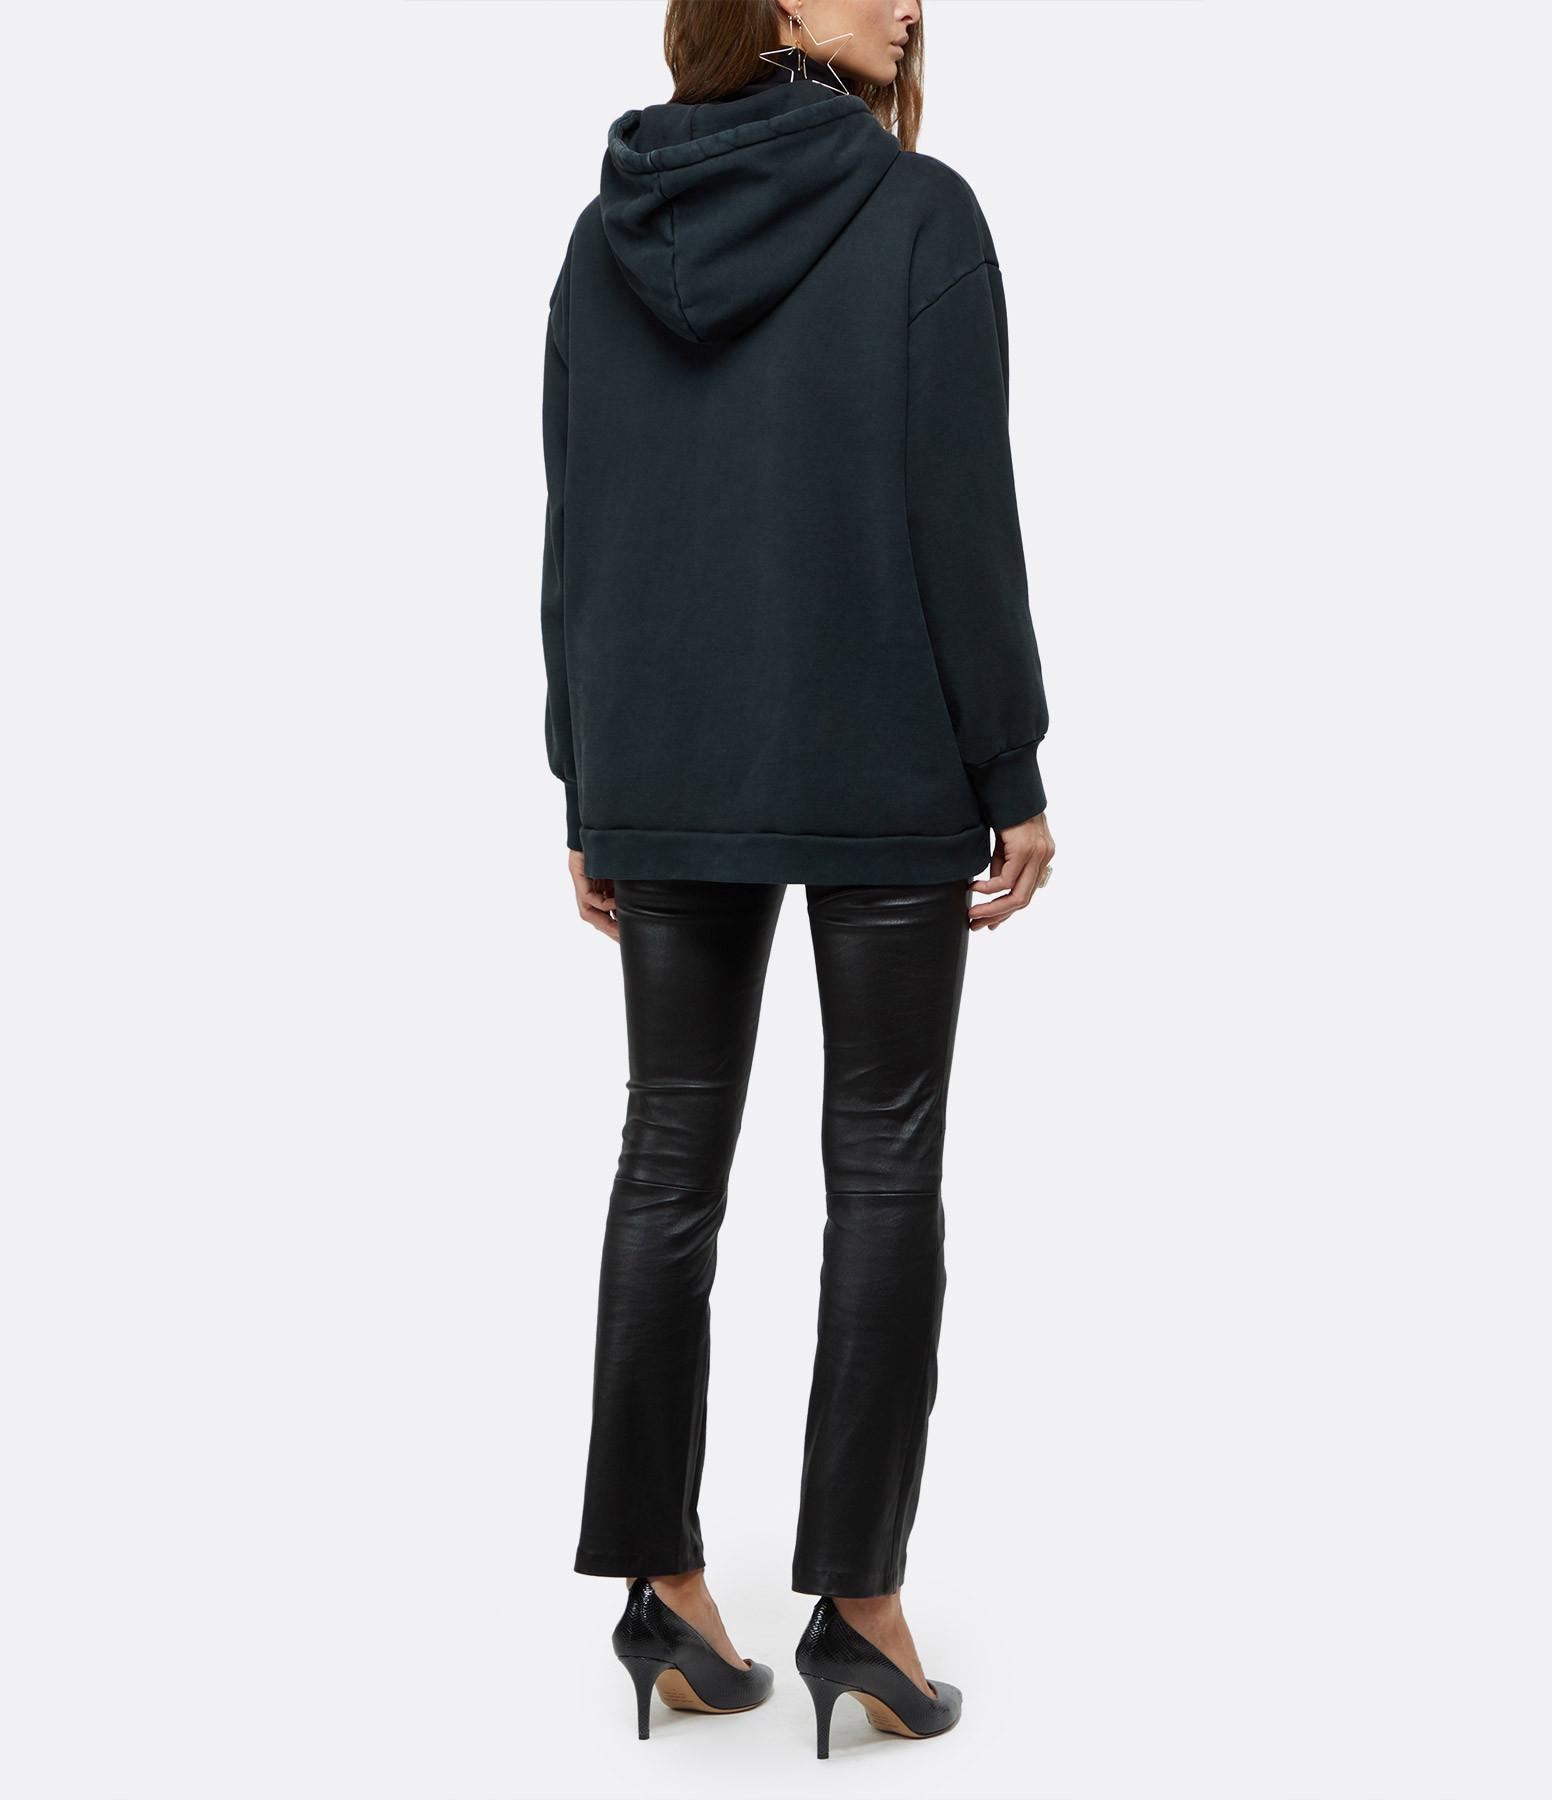 MARGAUX LONNBERG - Sweatshirt Parrish Noir